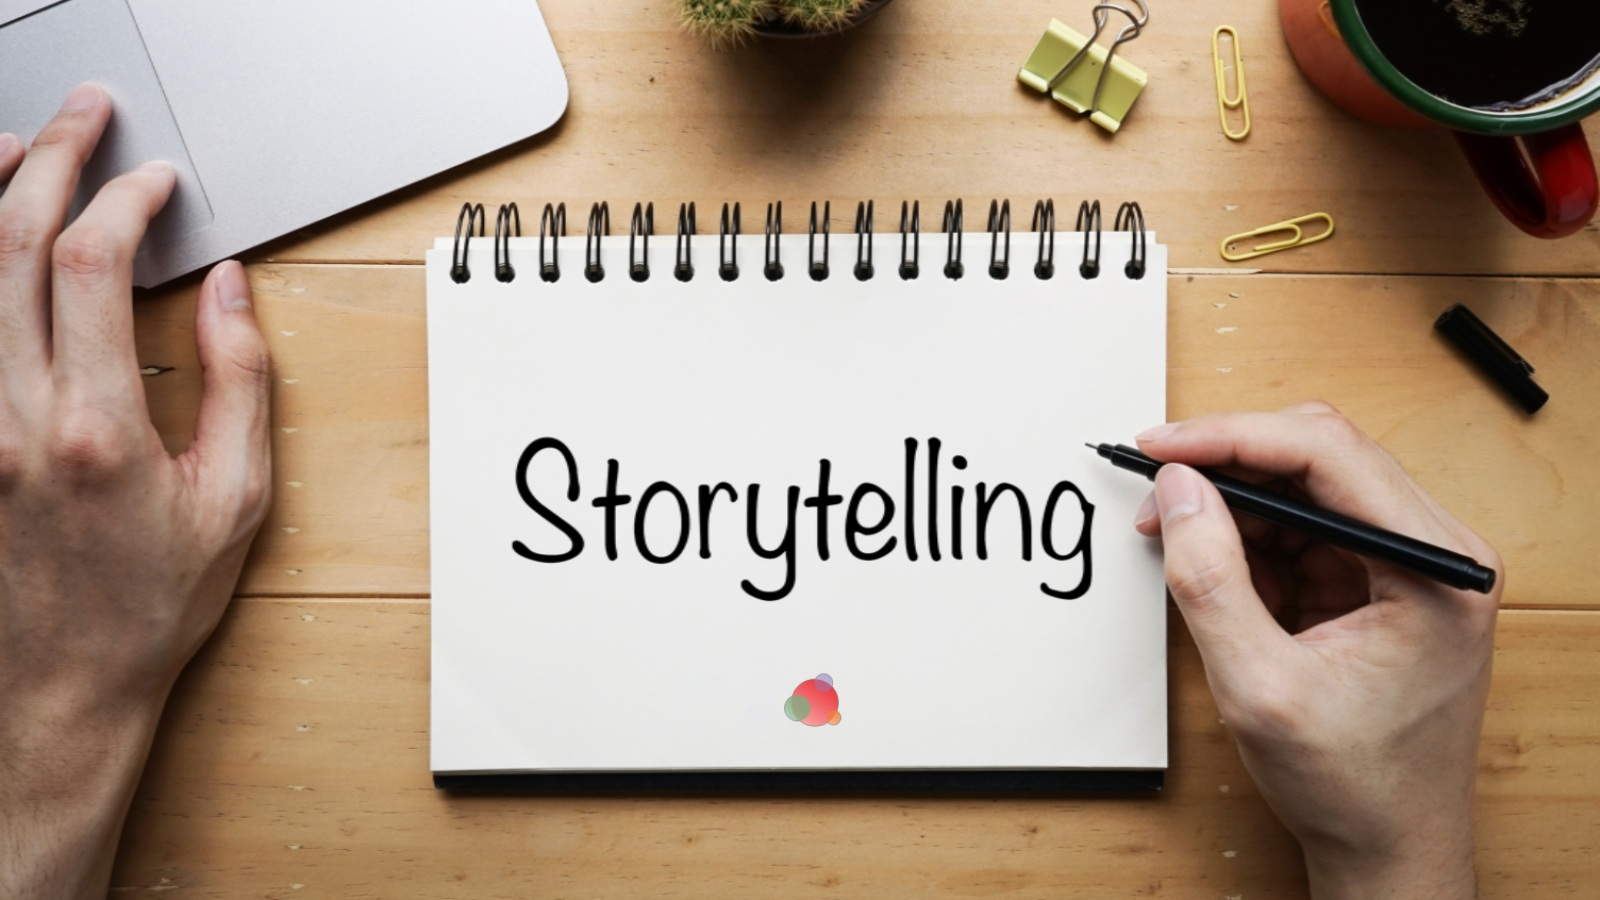 Storytelling: contar historias con impacto para influir